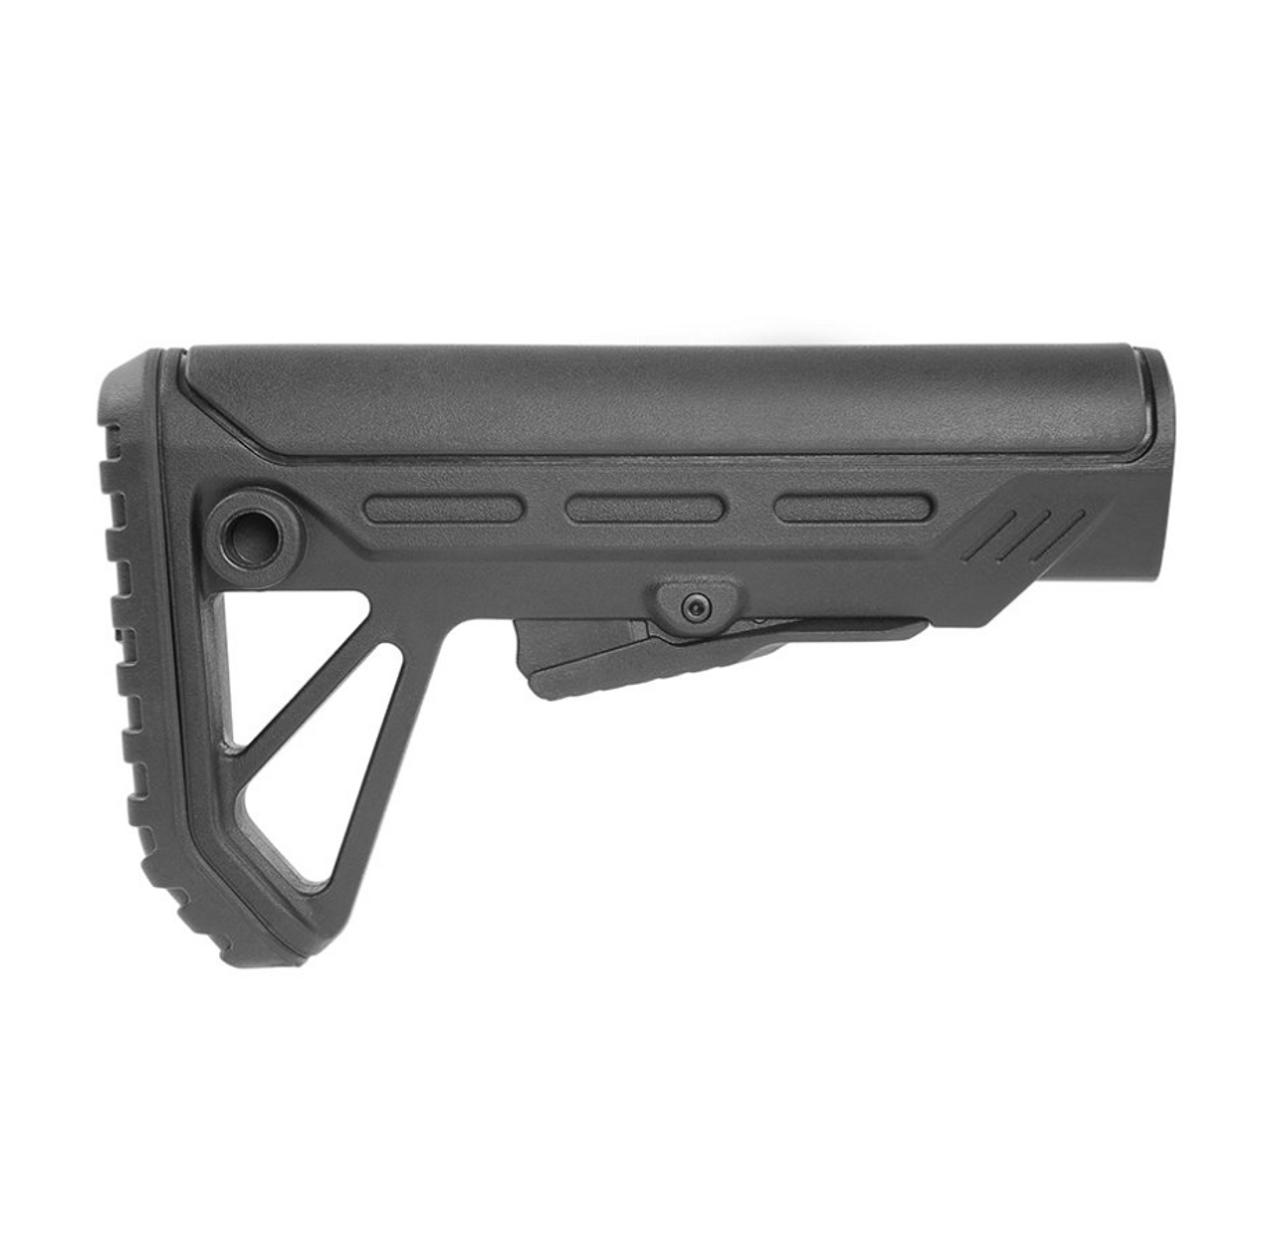 Trinity Force Surge Stock Mil-Spec Kit